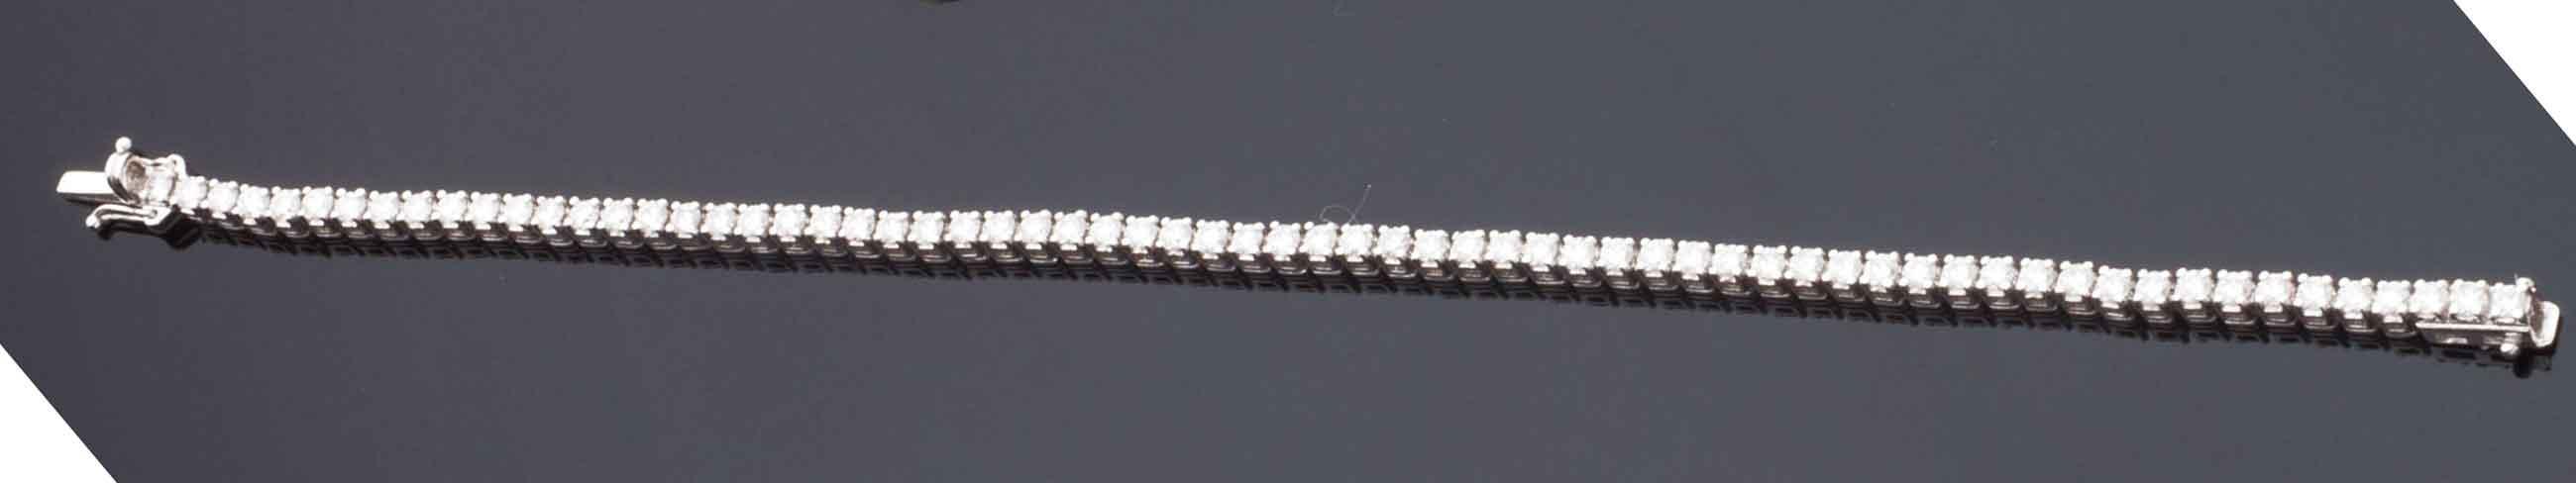 Bracciale tennis in oro bianco 18 kt